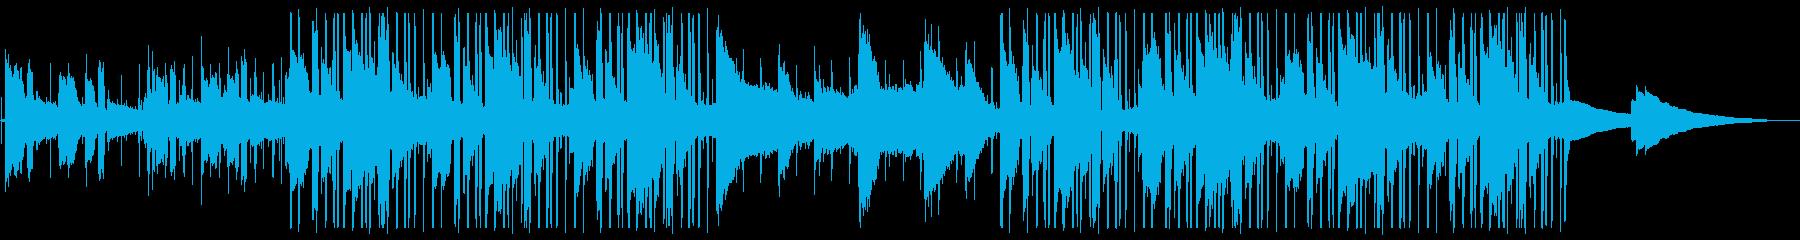 Joplin's Bar 音楽の街の再生済みの波形